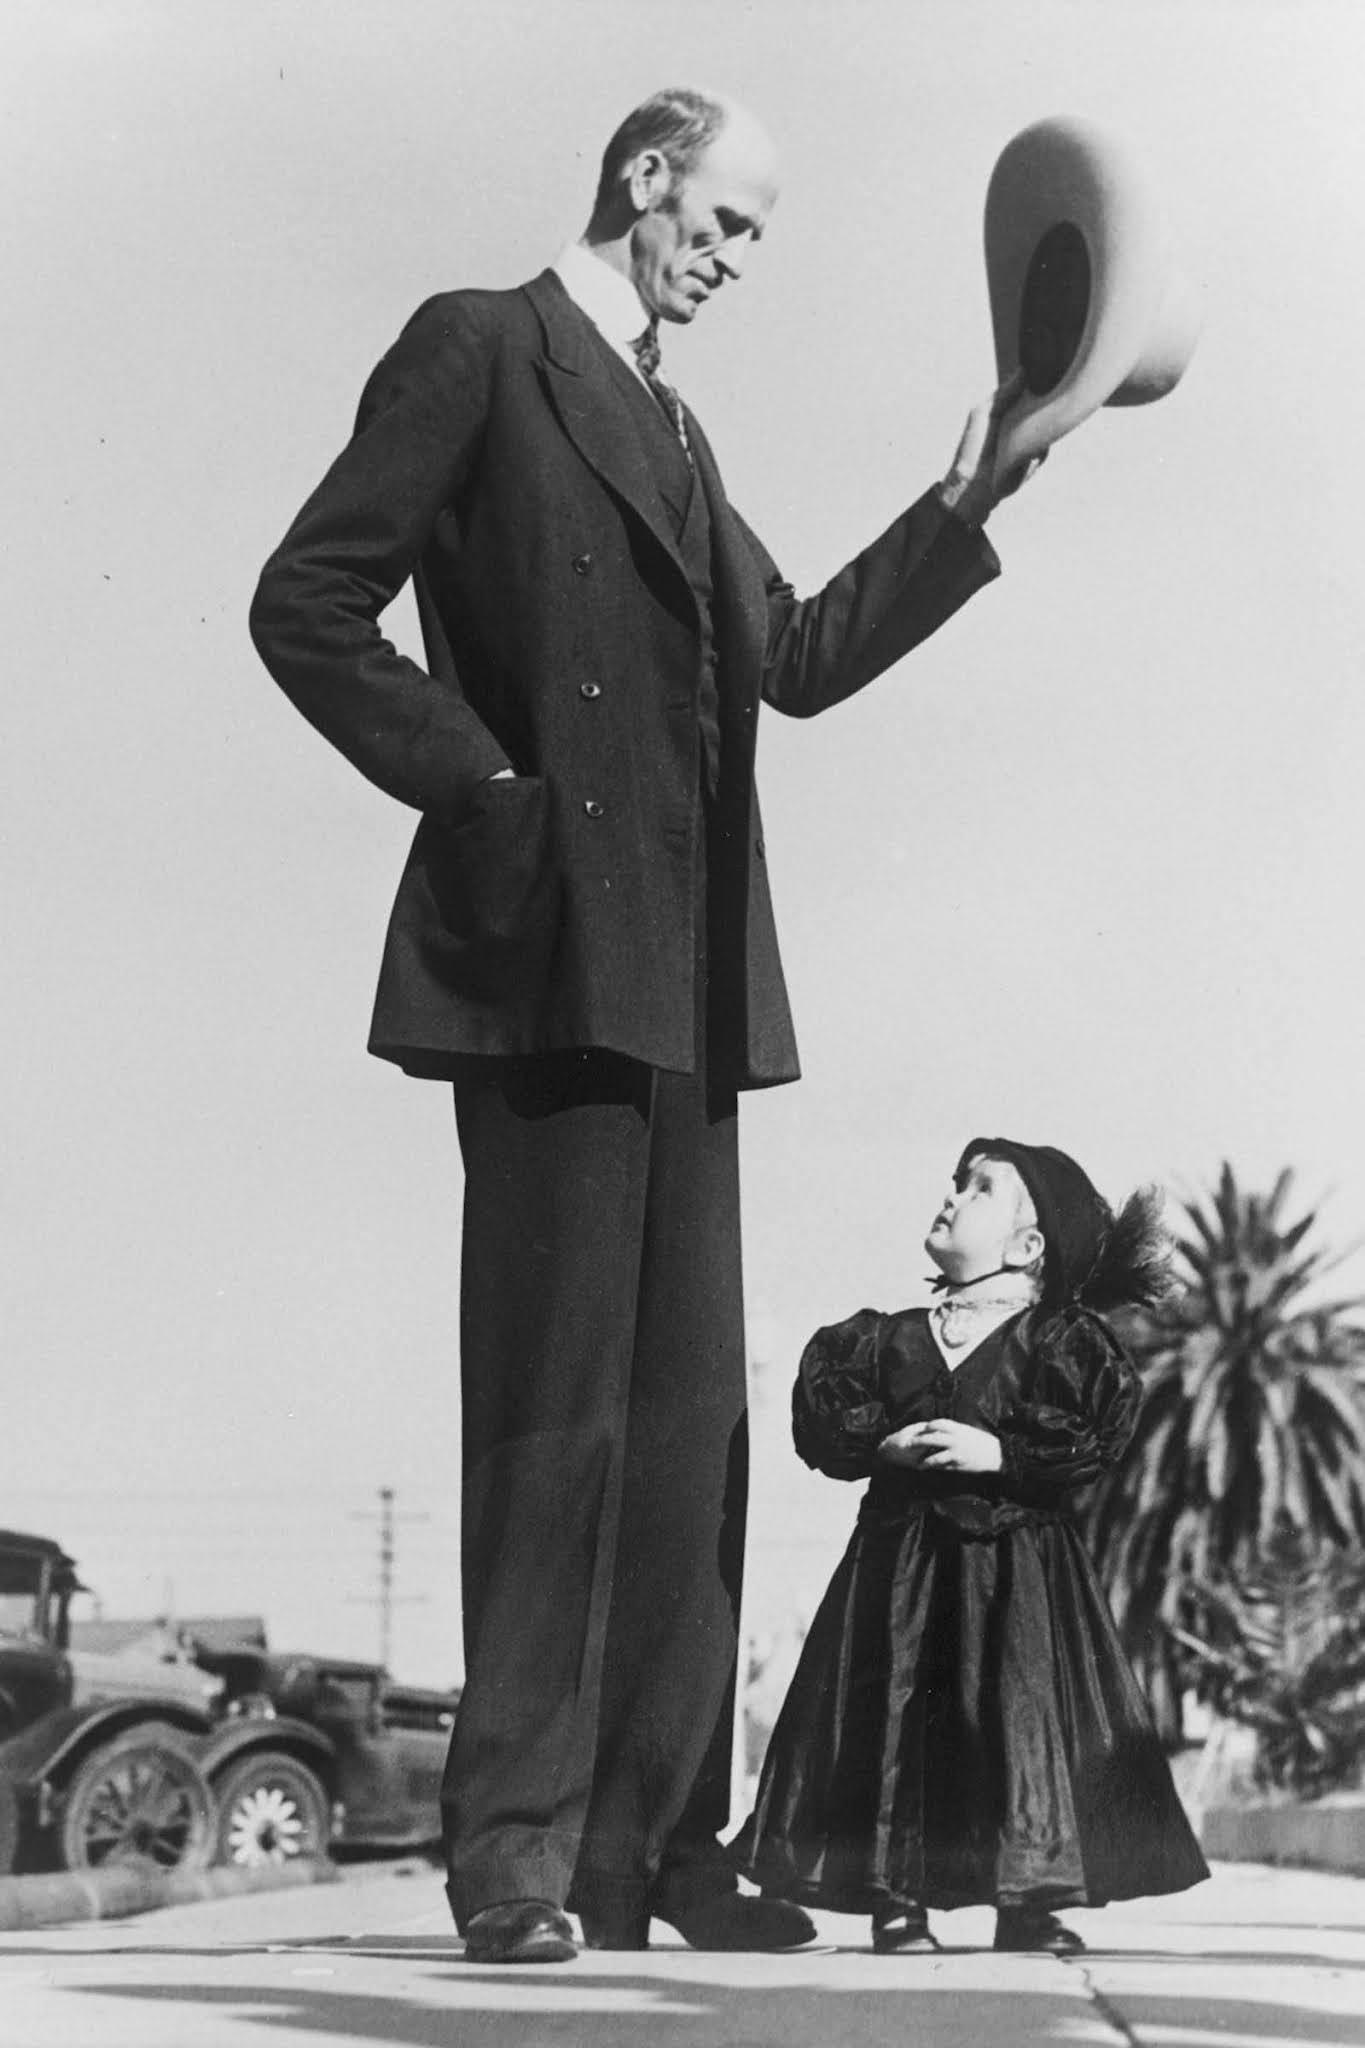 Tallest cowboy ralph tex madsen